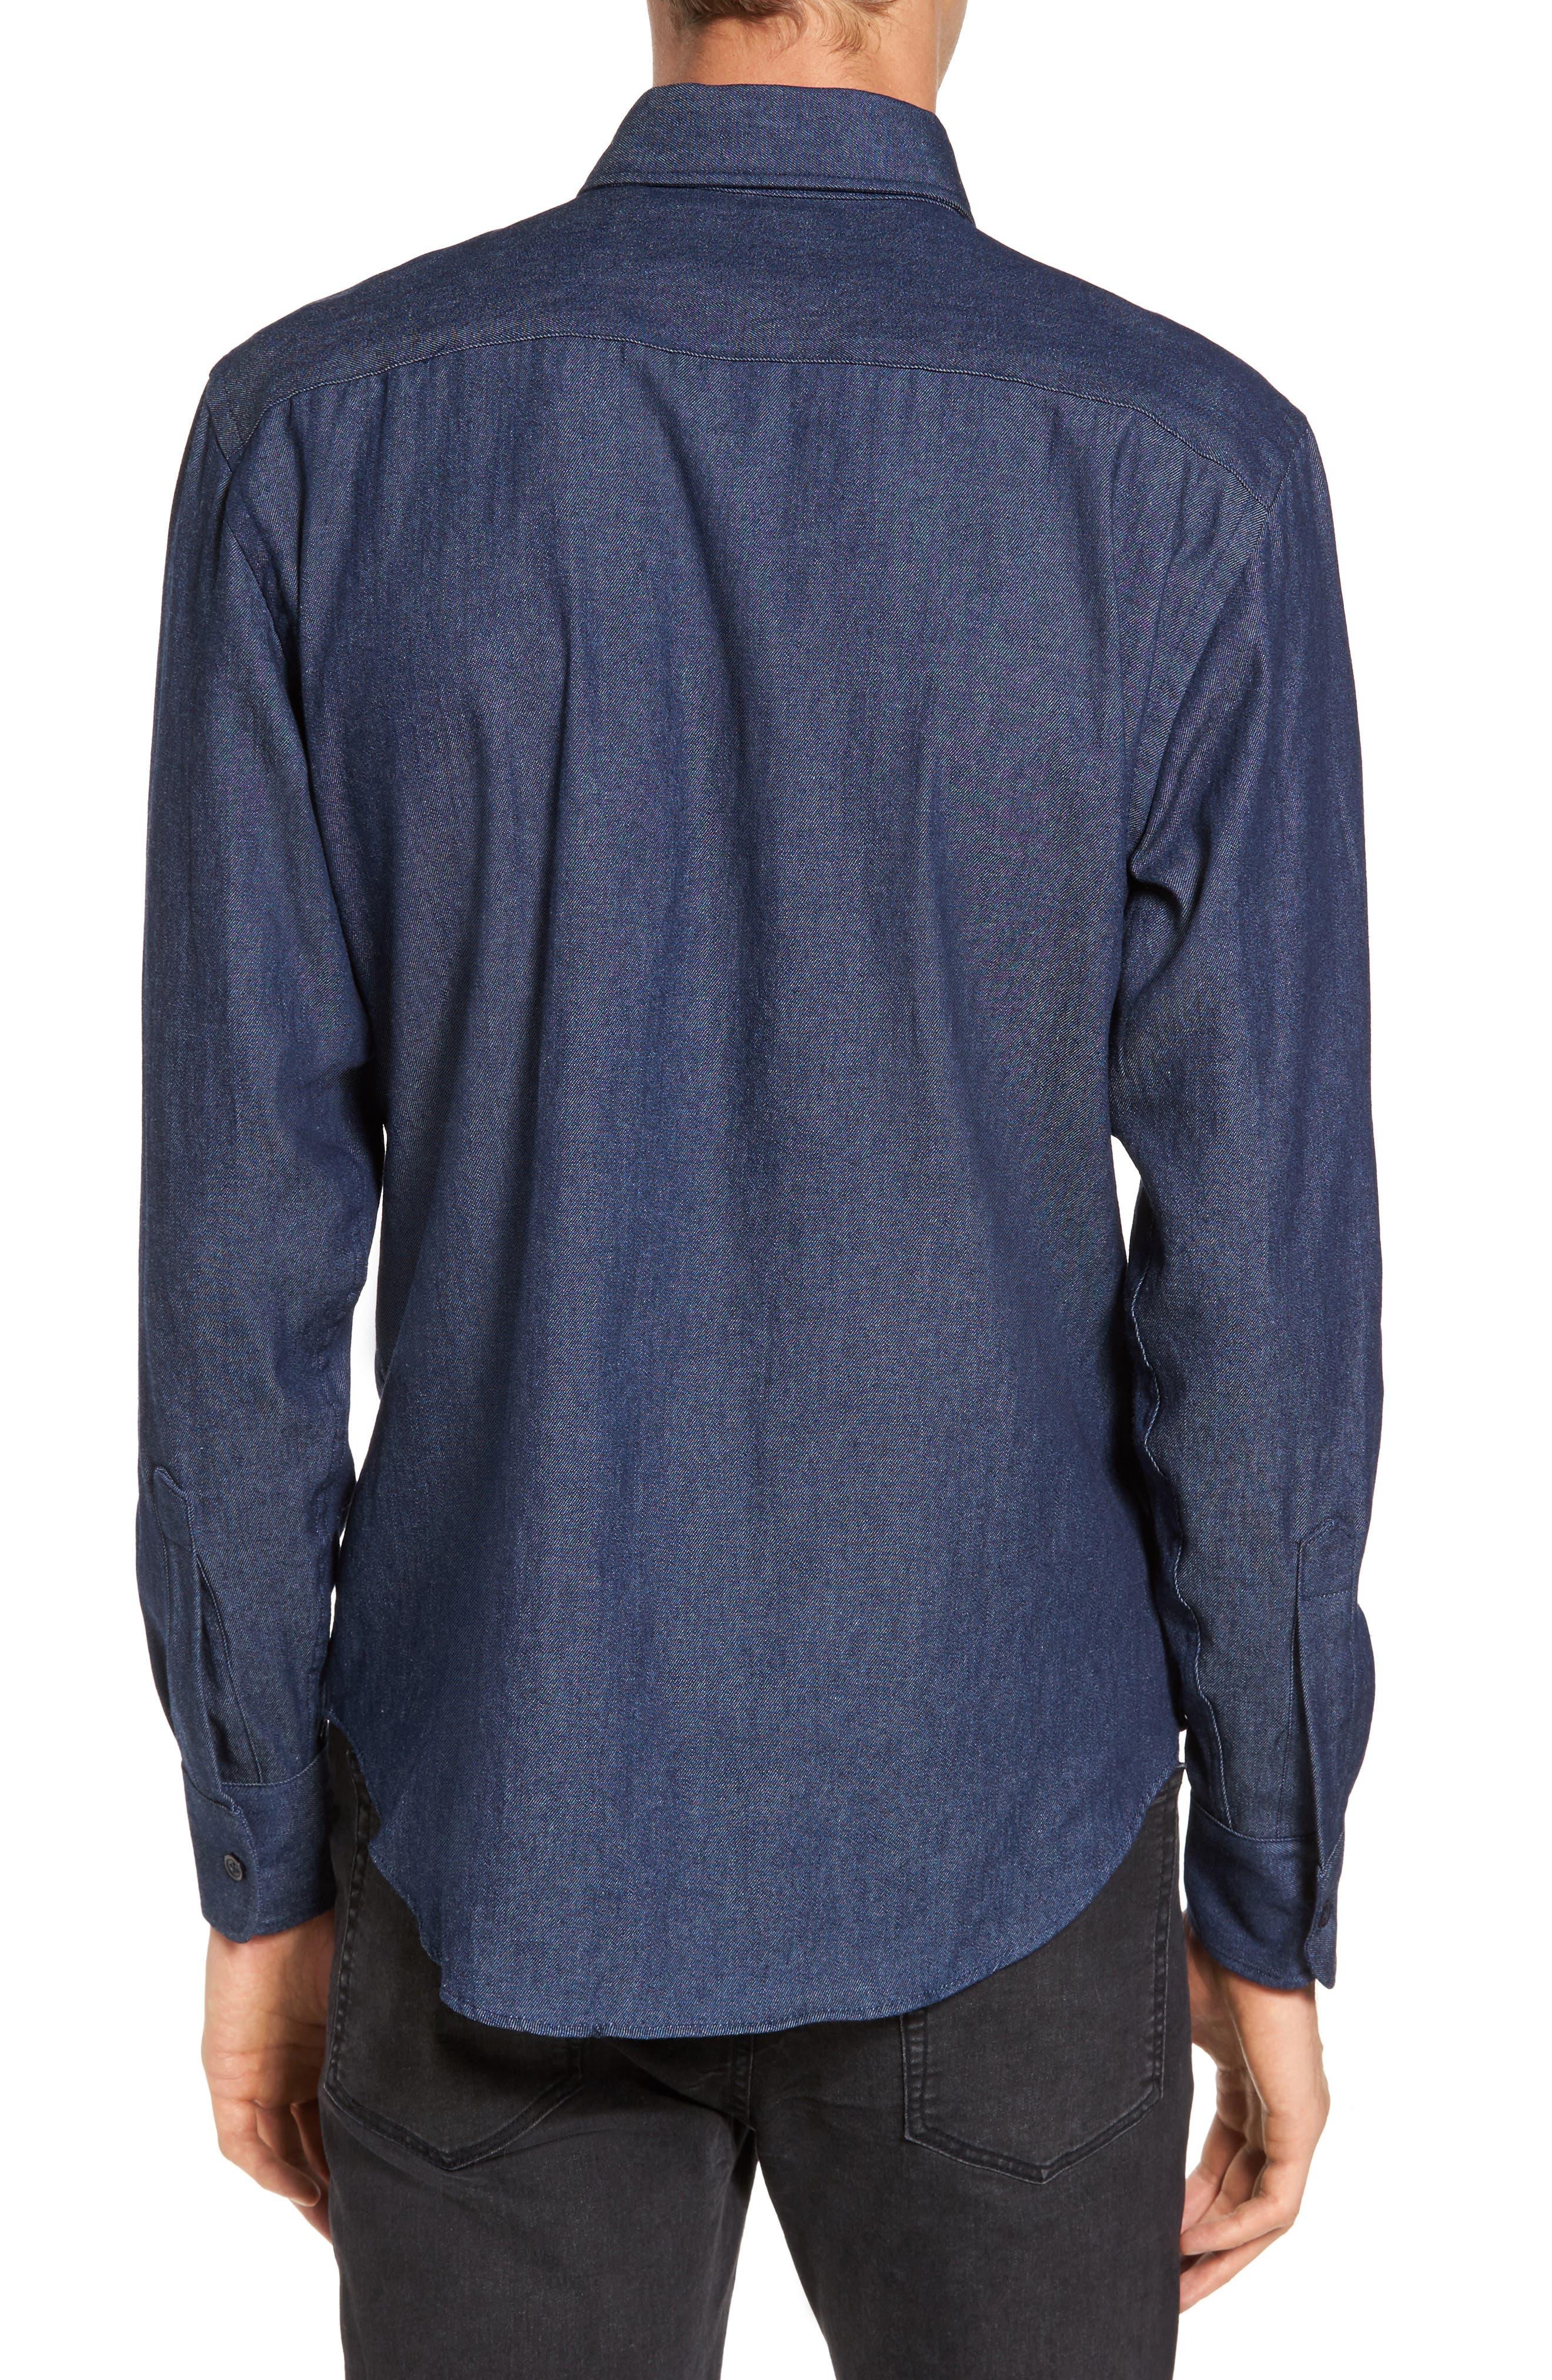 Indigo Long Sleeve Shirt,                             Alternate thumbnail 2, color,                             Indigo